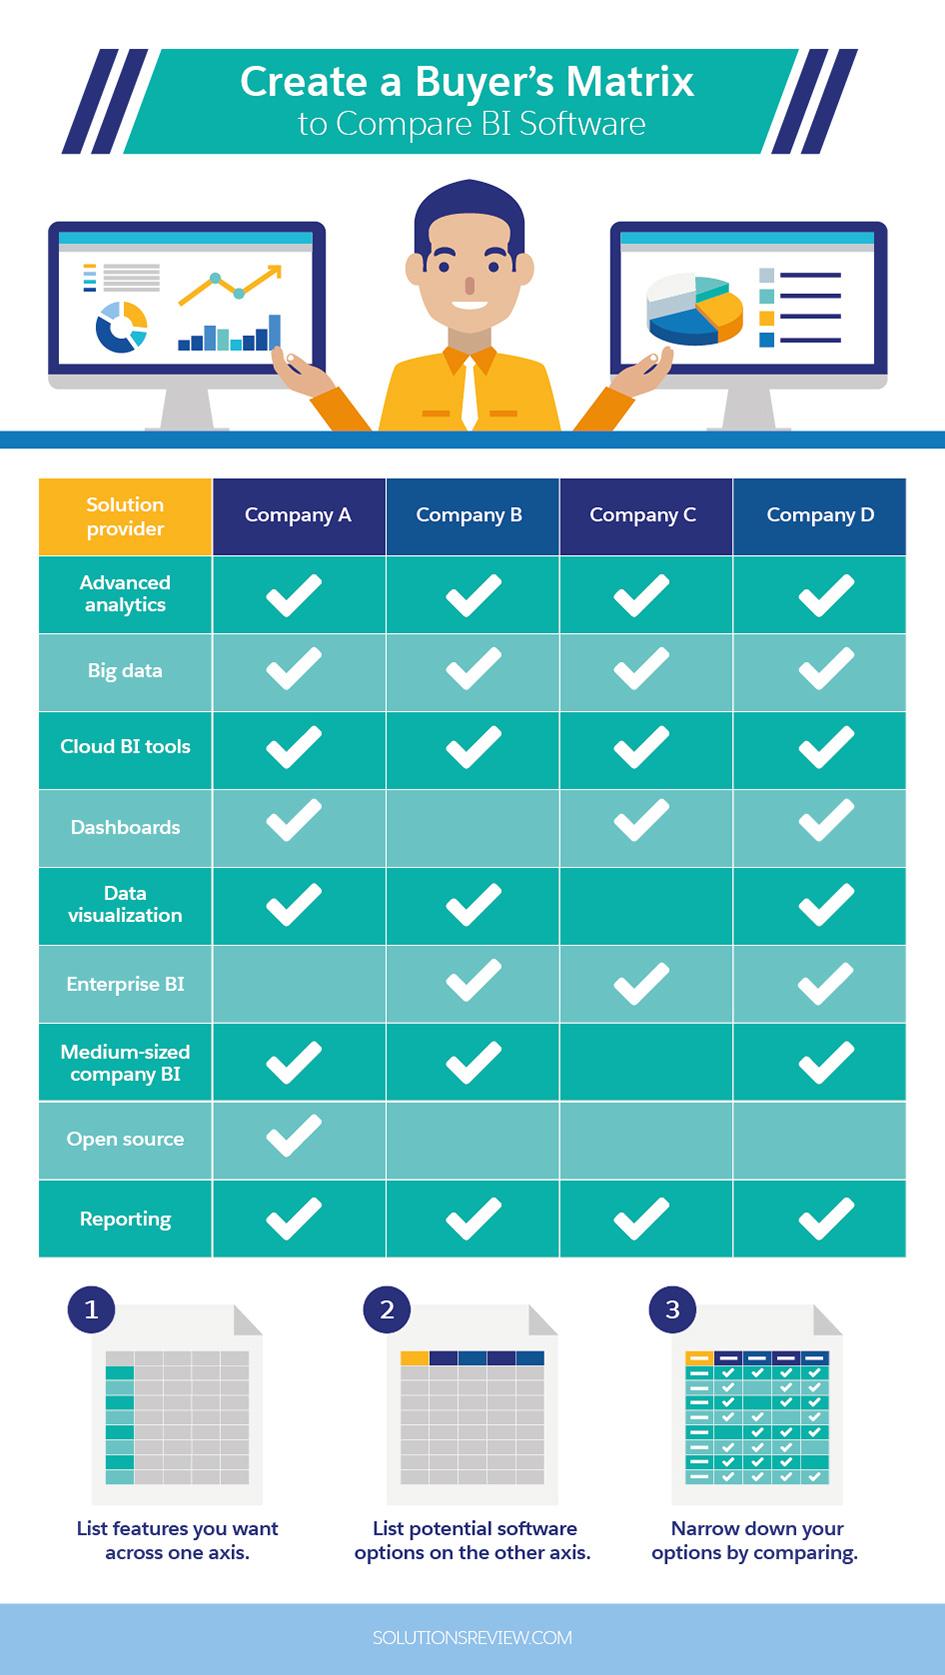 Create a Buyer's Matrix to Compare BI Software